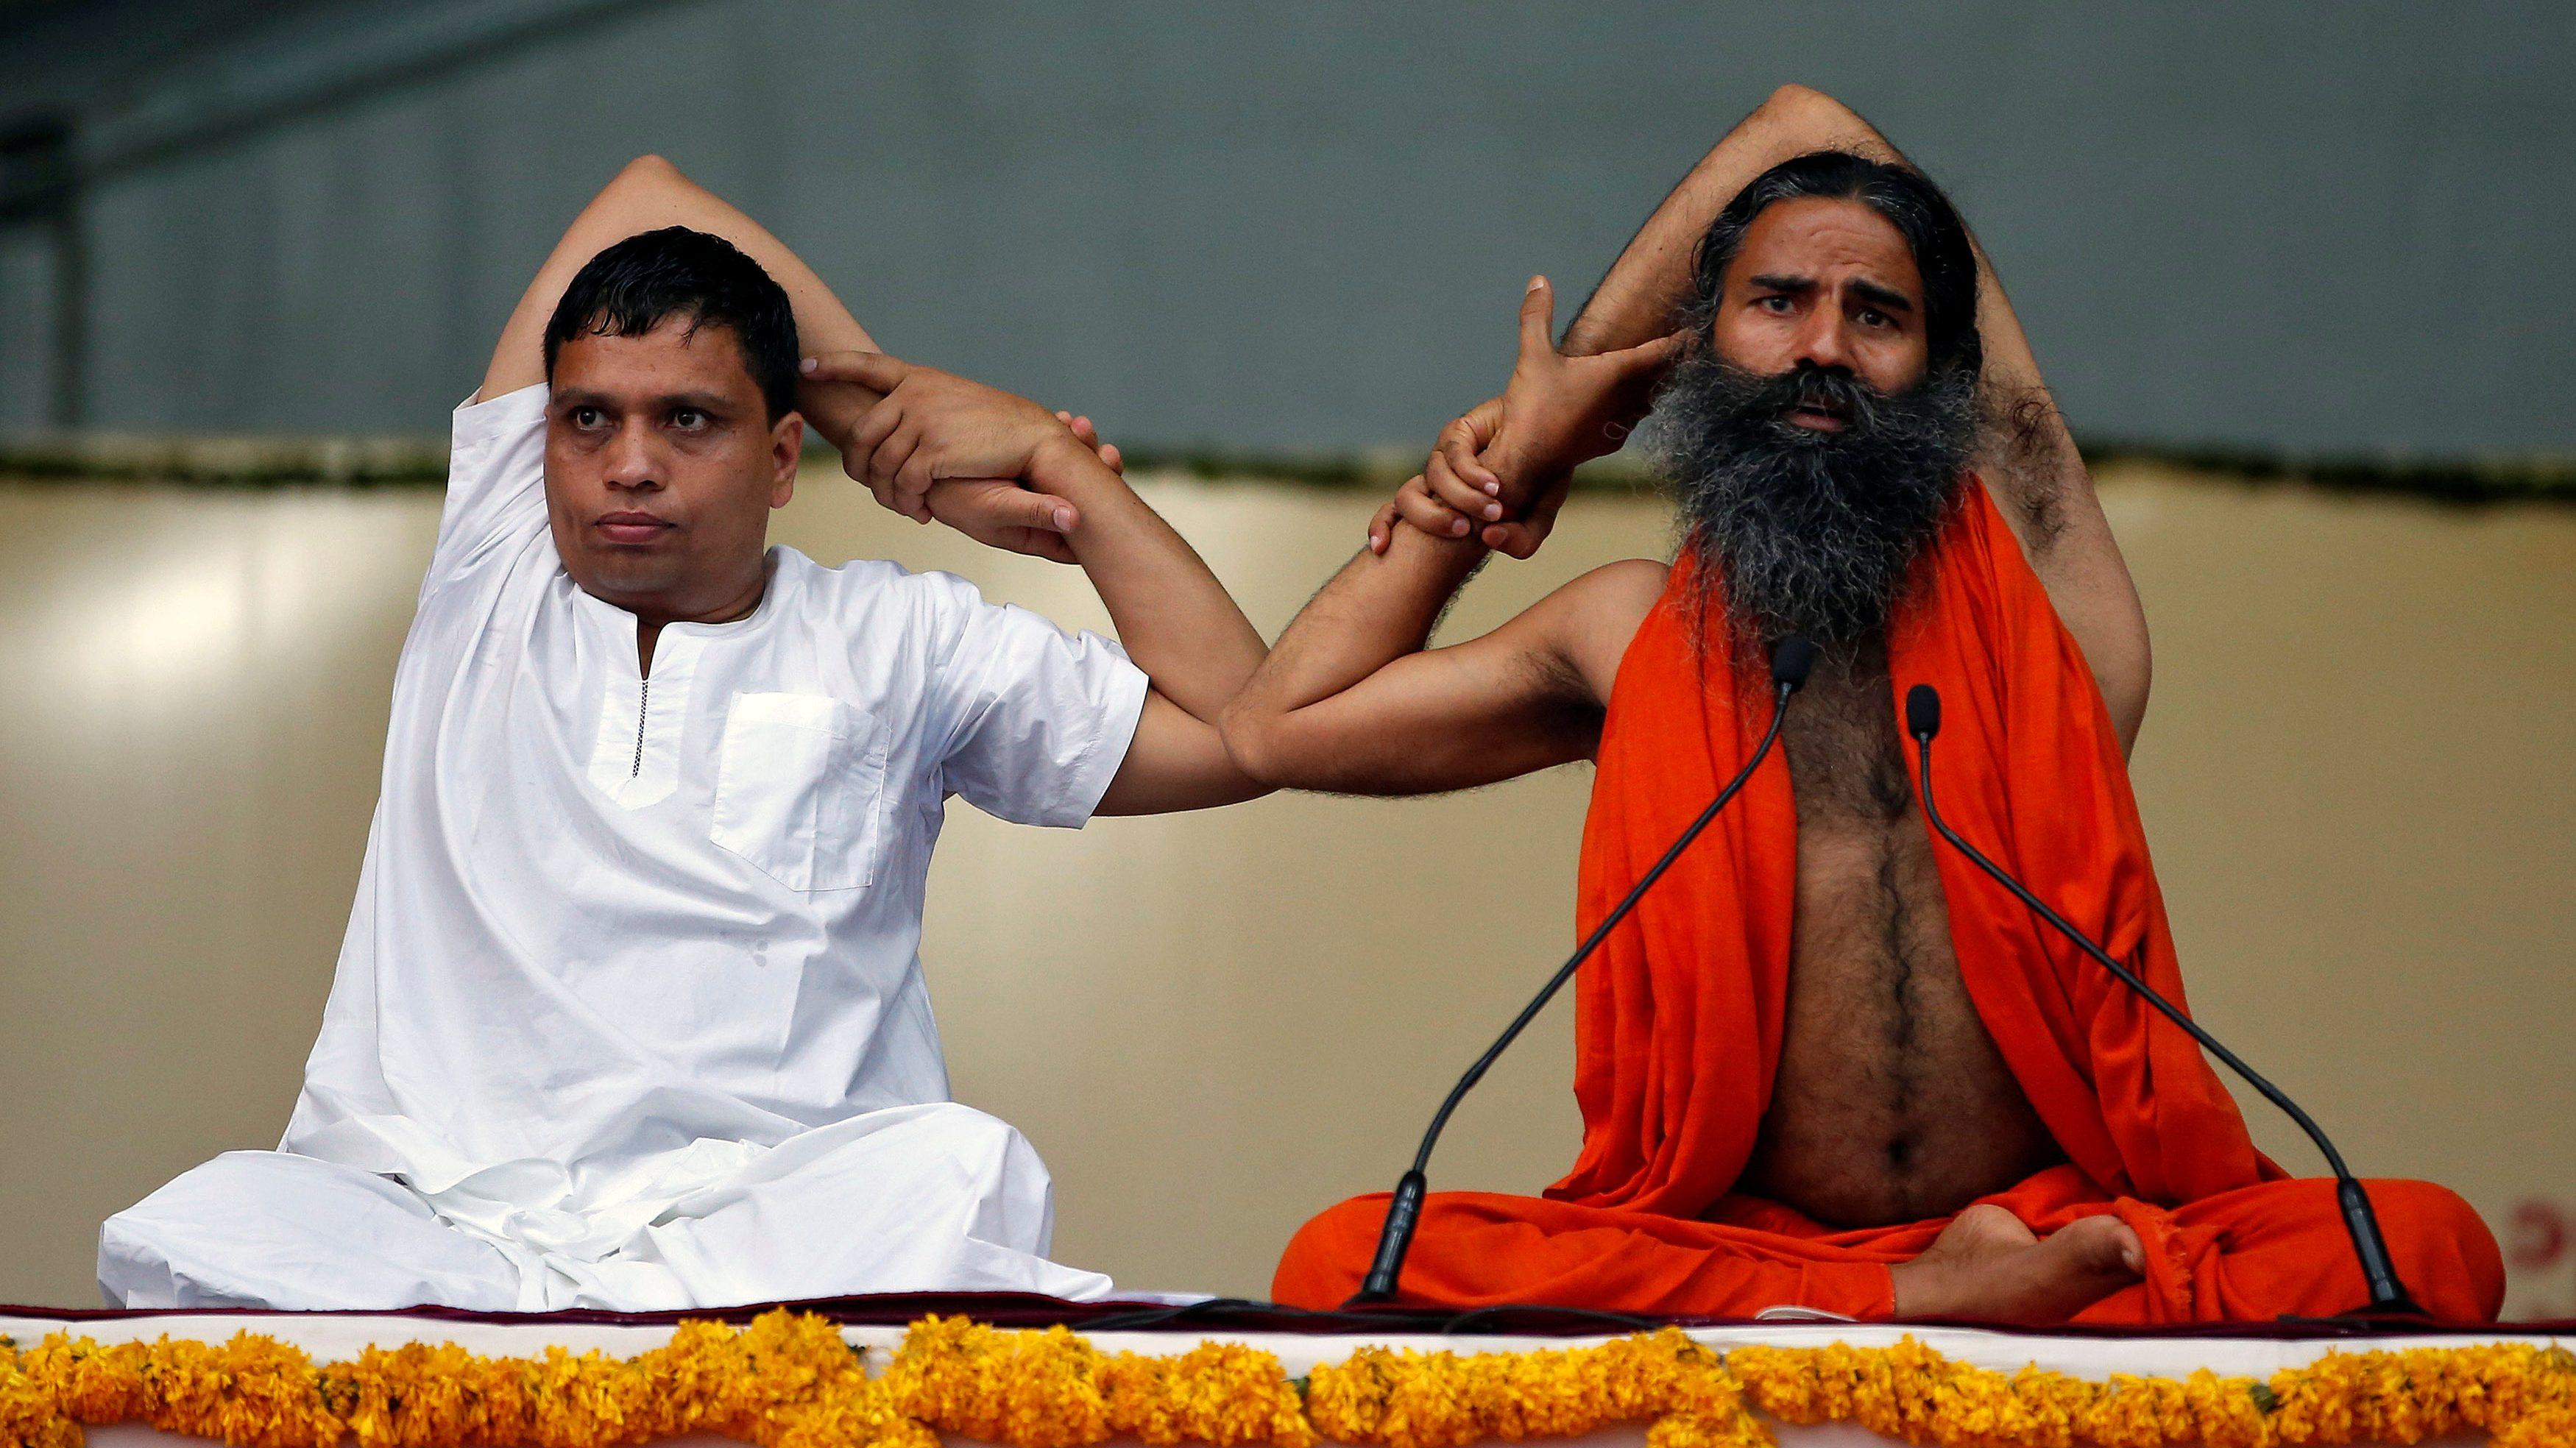 Yoga guru Baba Ramdev and Managing Director ofPatanjali Ayurved Acharya Balkrishna perform yoga during a four-day long camp ahead of International Yoga day, in Ahmedabad